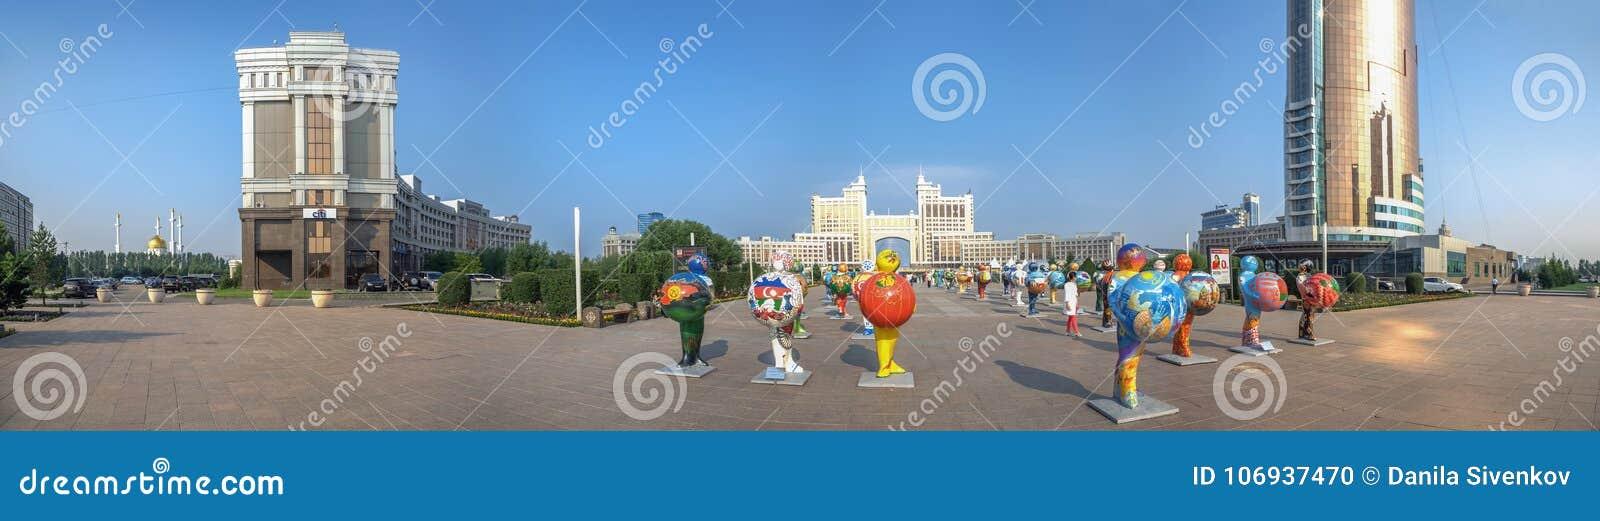 ASTANA KAZACHSTAN, LIPIEC, - 2, 2016: Ranek panorama z plastikowymi postaciami